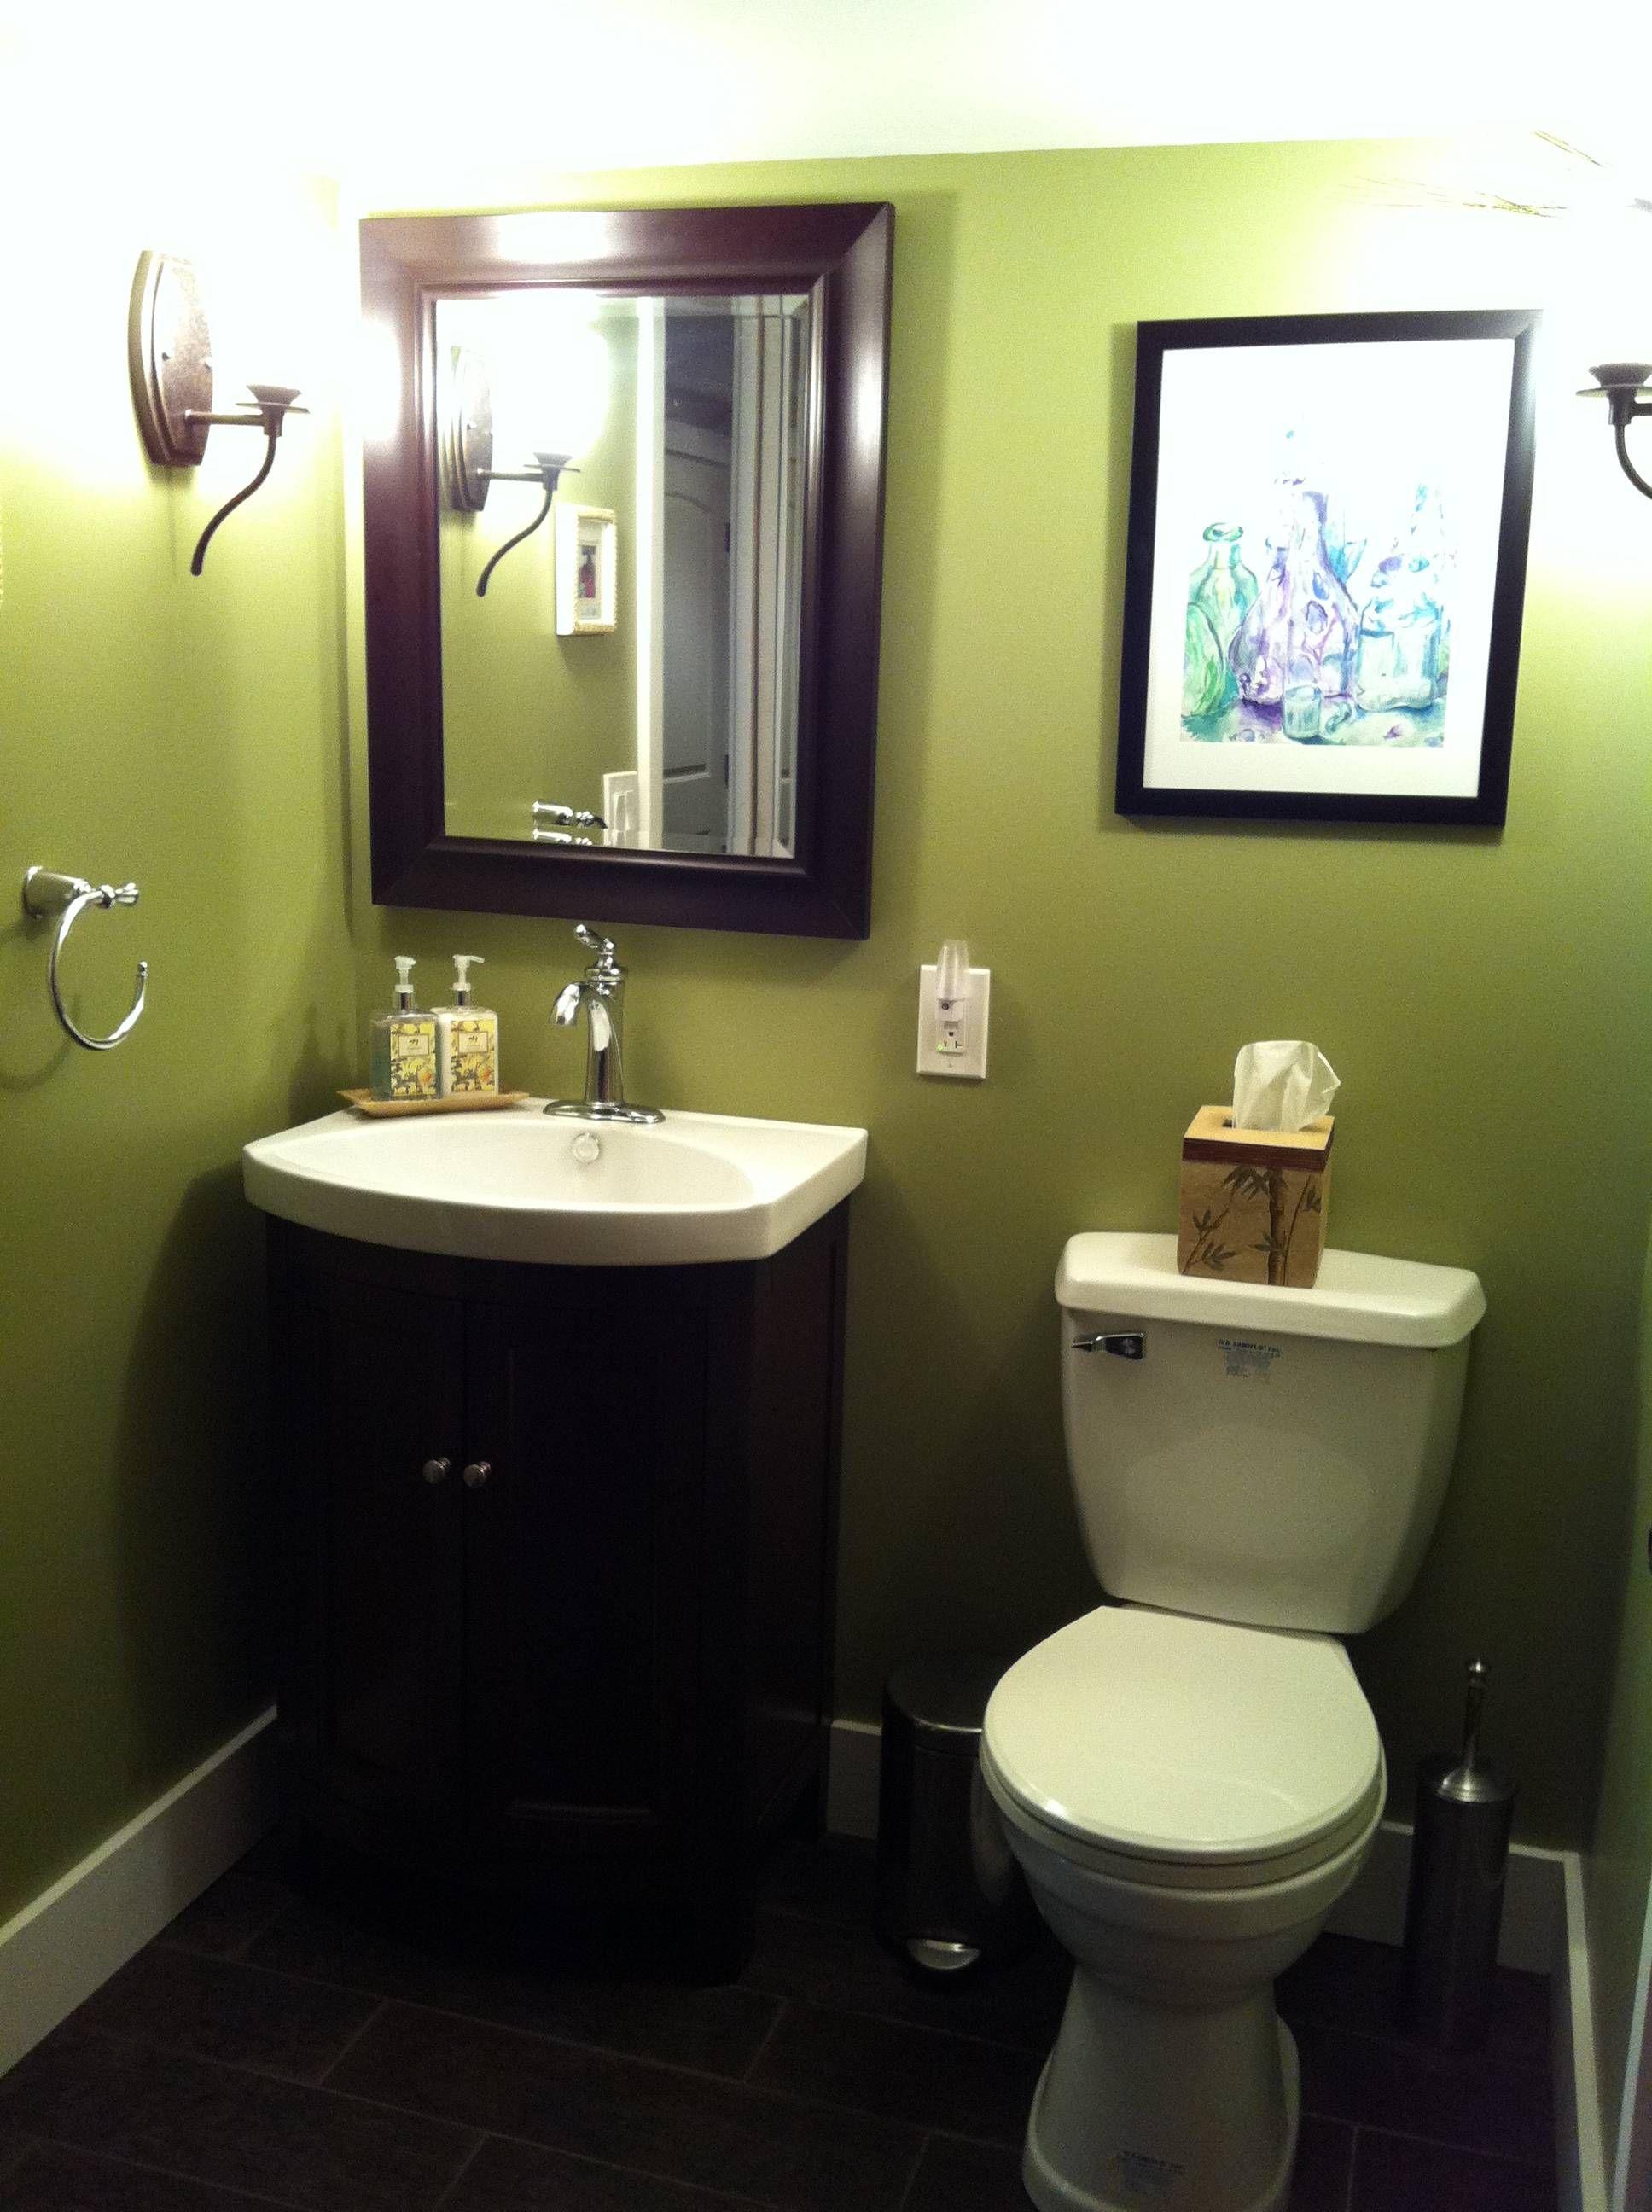 Powder room | Bathroom remodel ideas | Pinterest